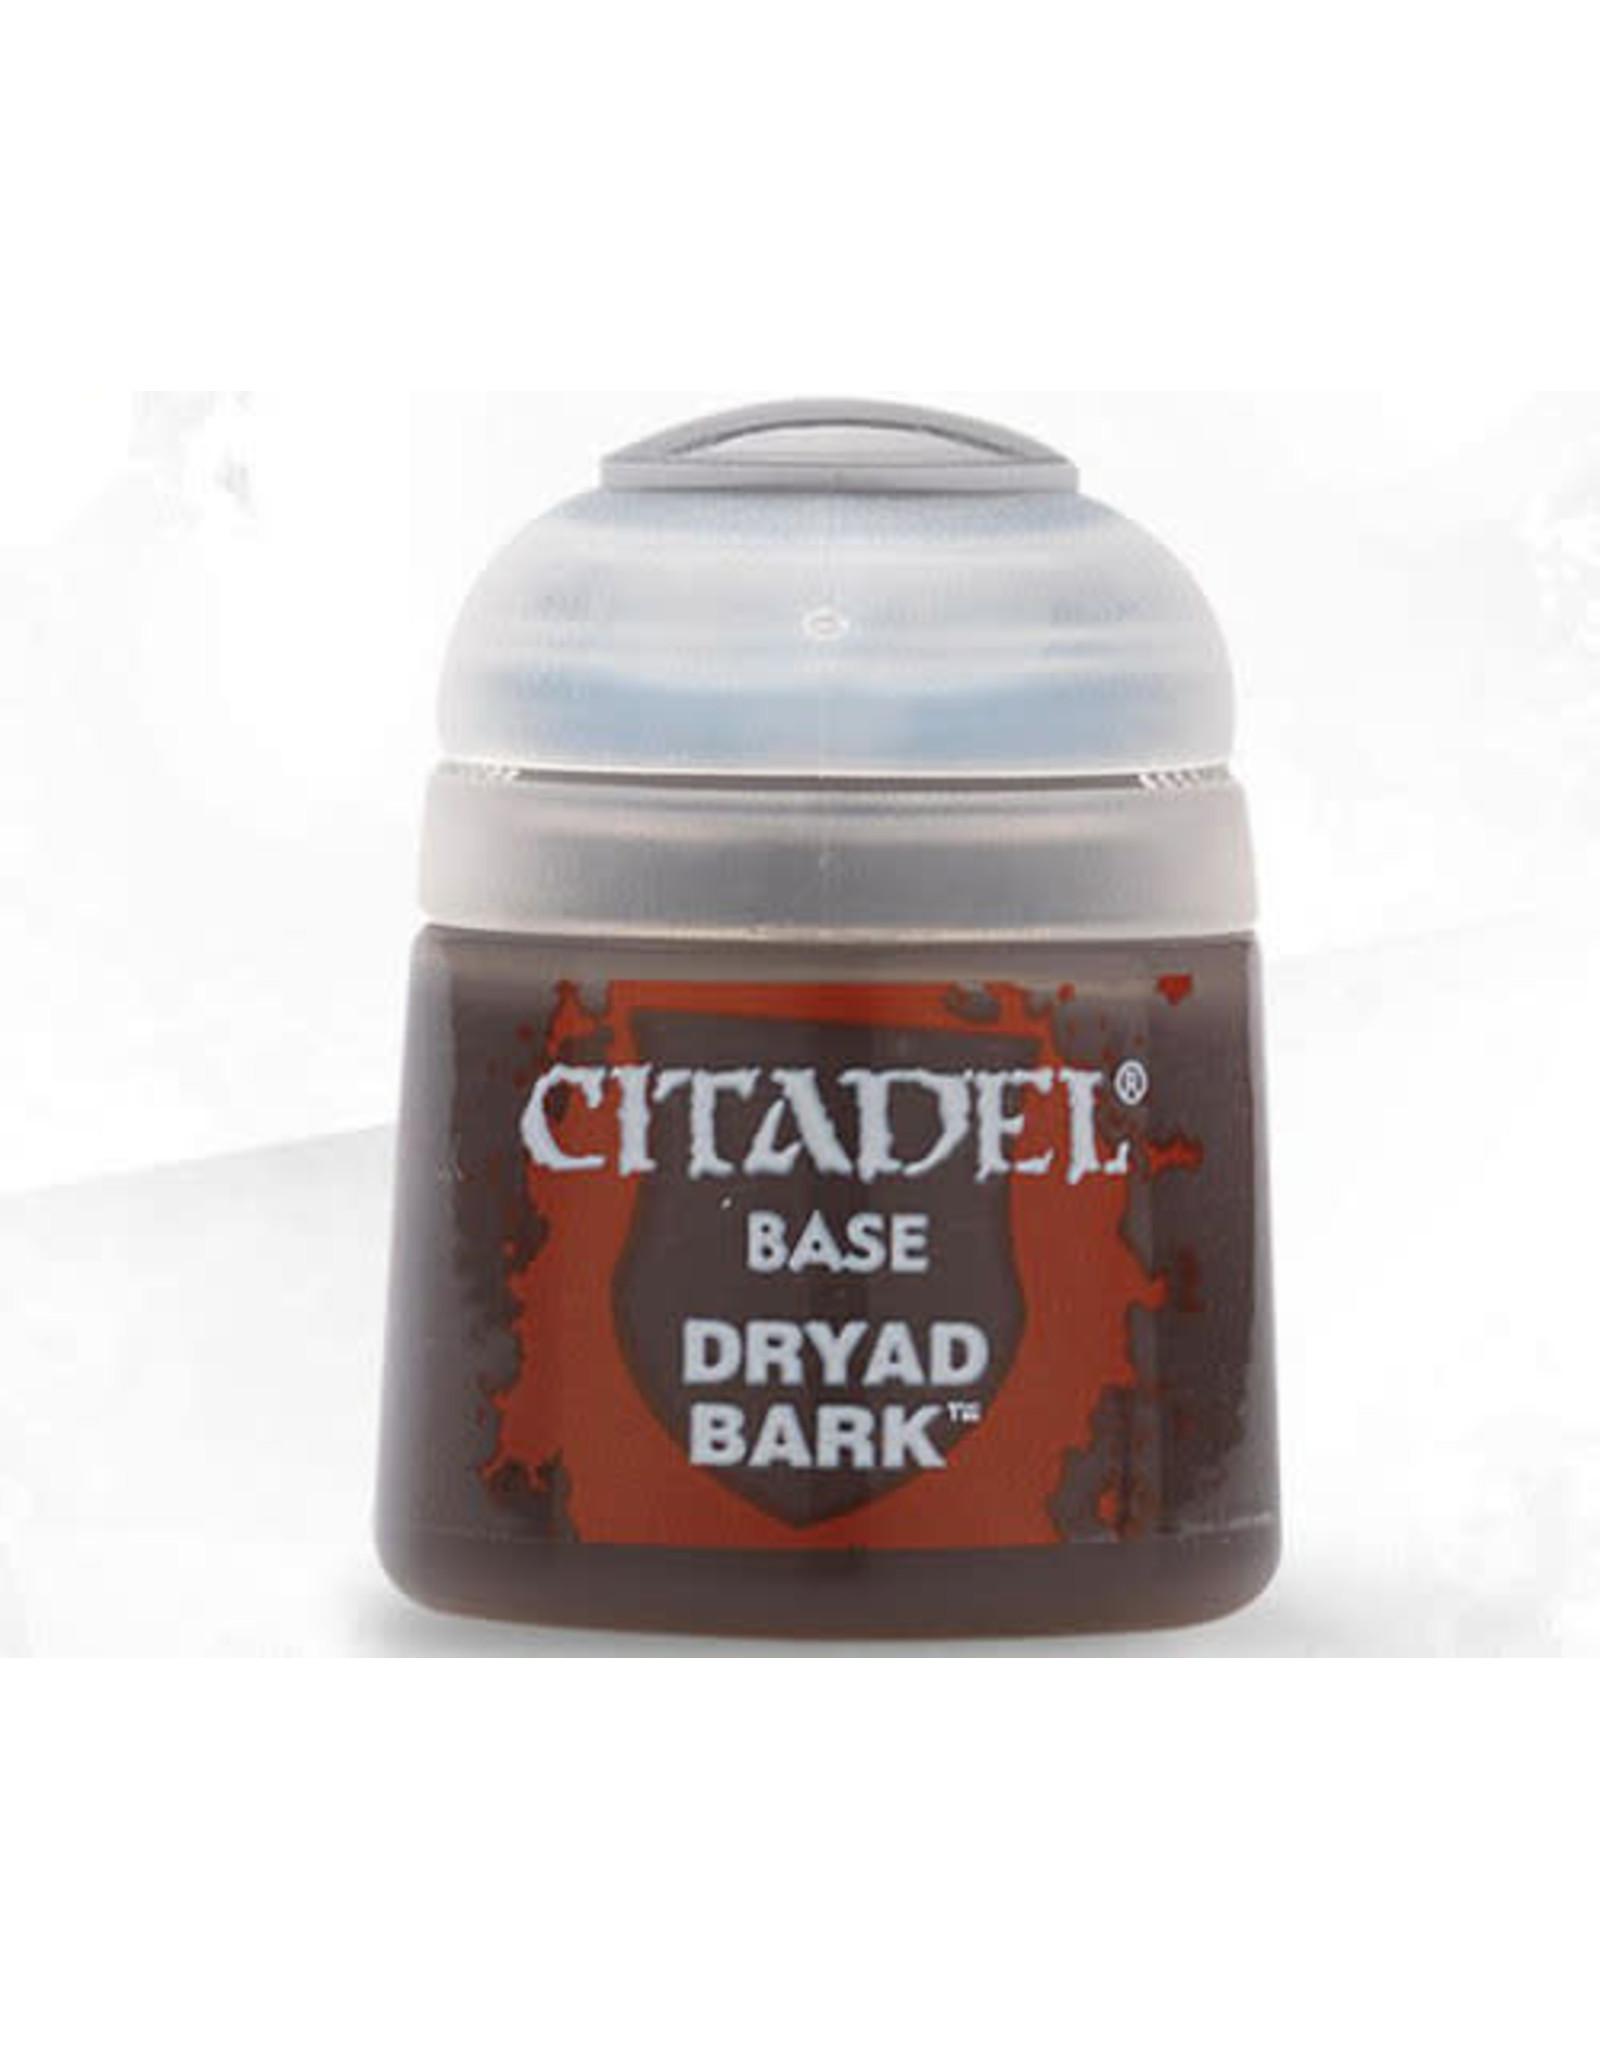 Games Workshop Citadel Paint: Dryad Bark 12ml